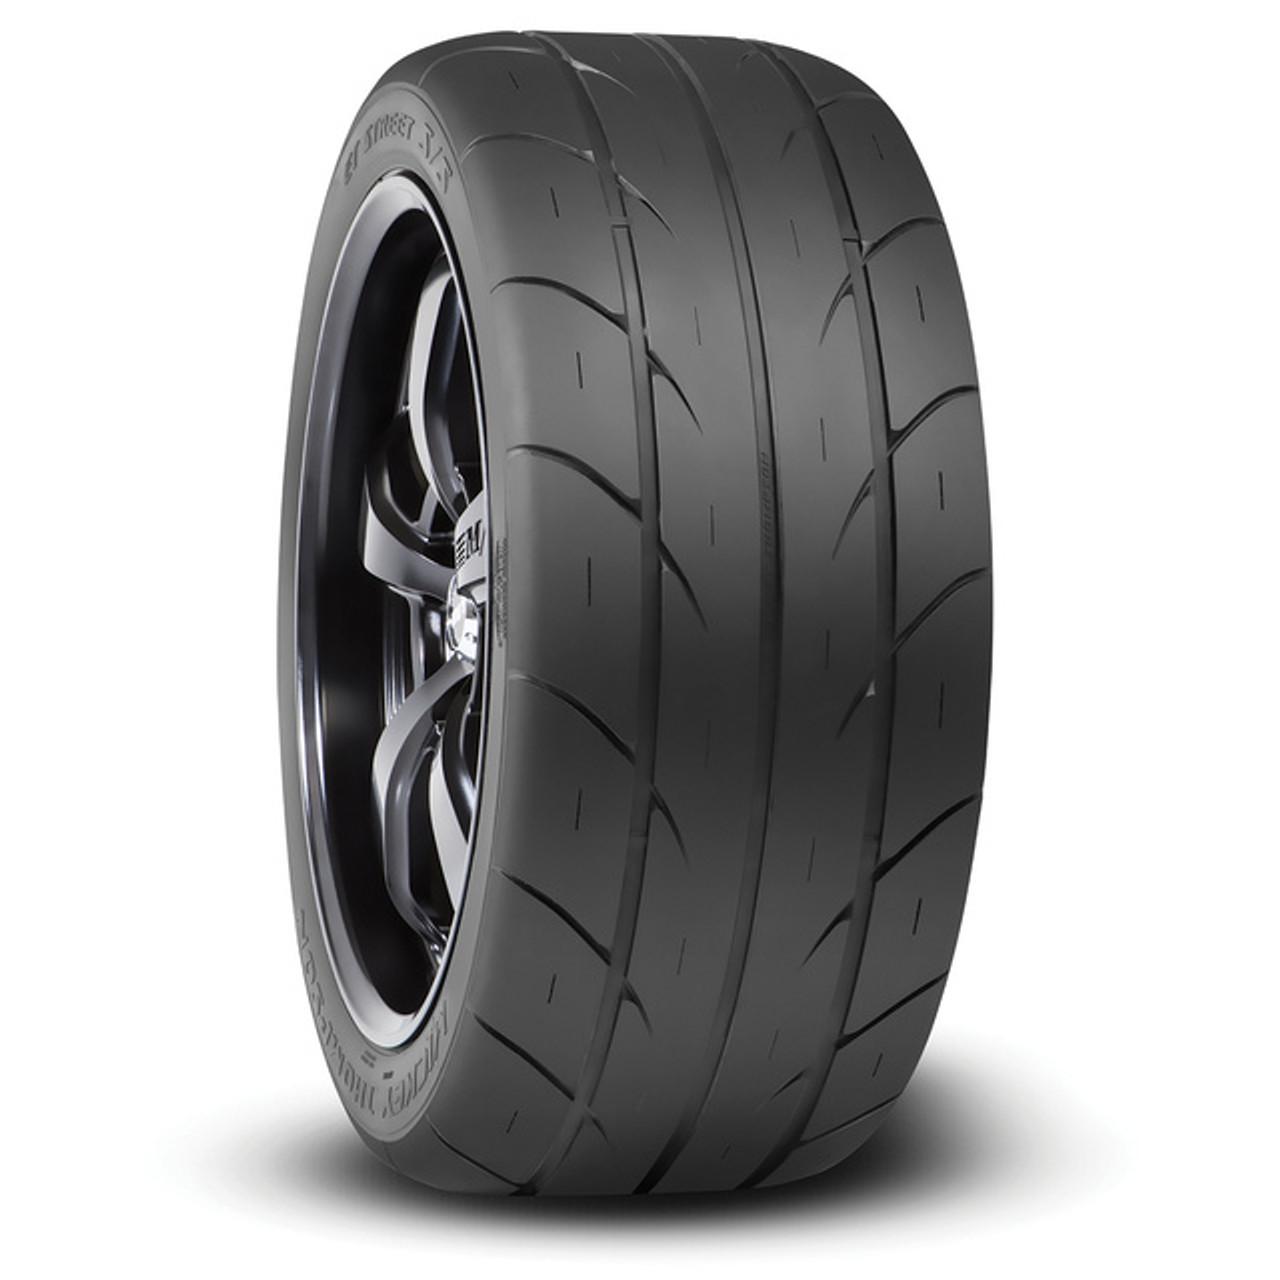 295//35R18 99Y Mickey Thompson Street Comp Performance Radial Tire